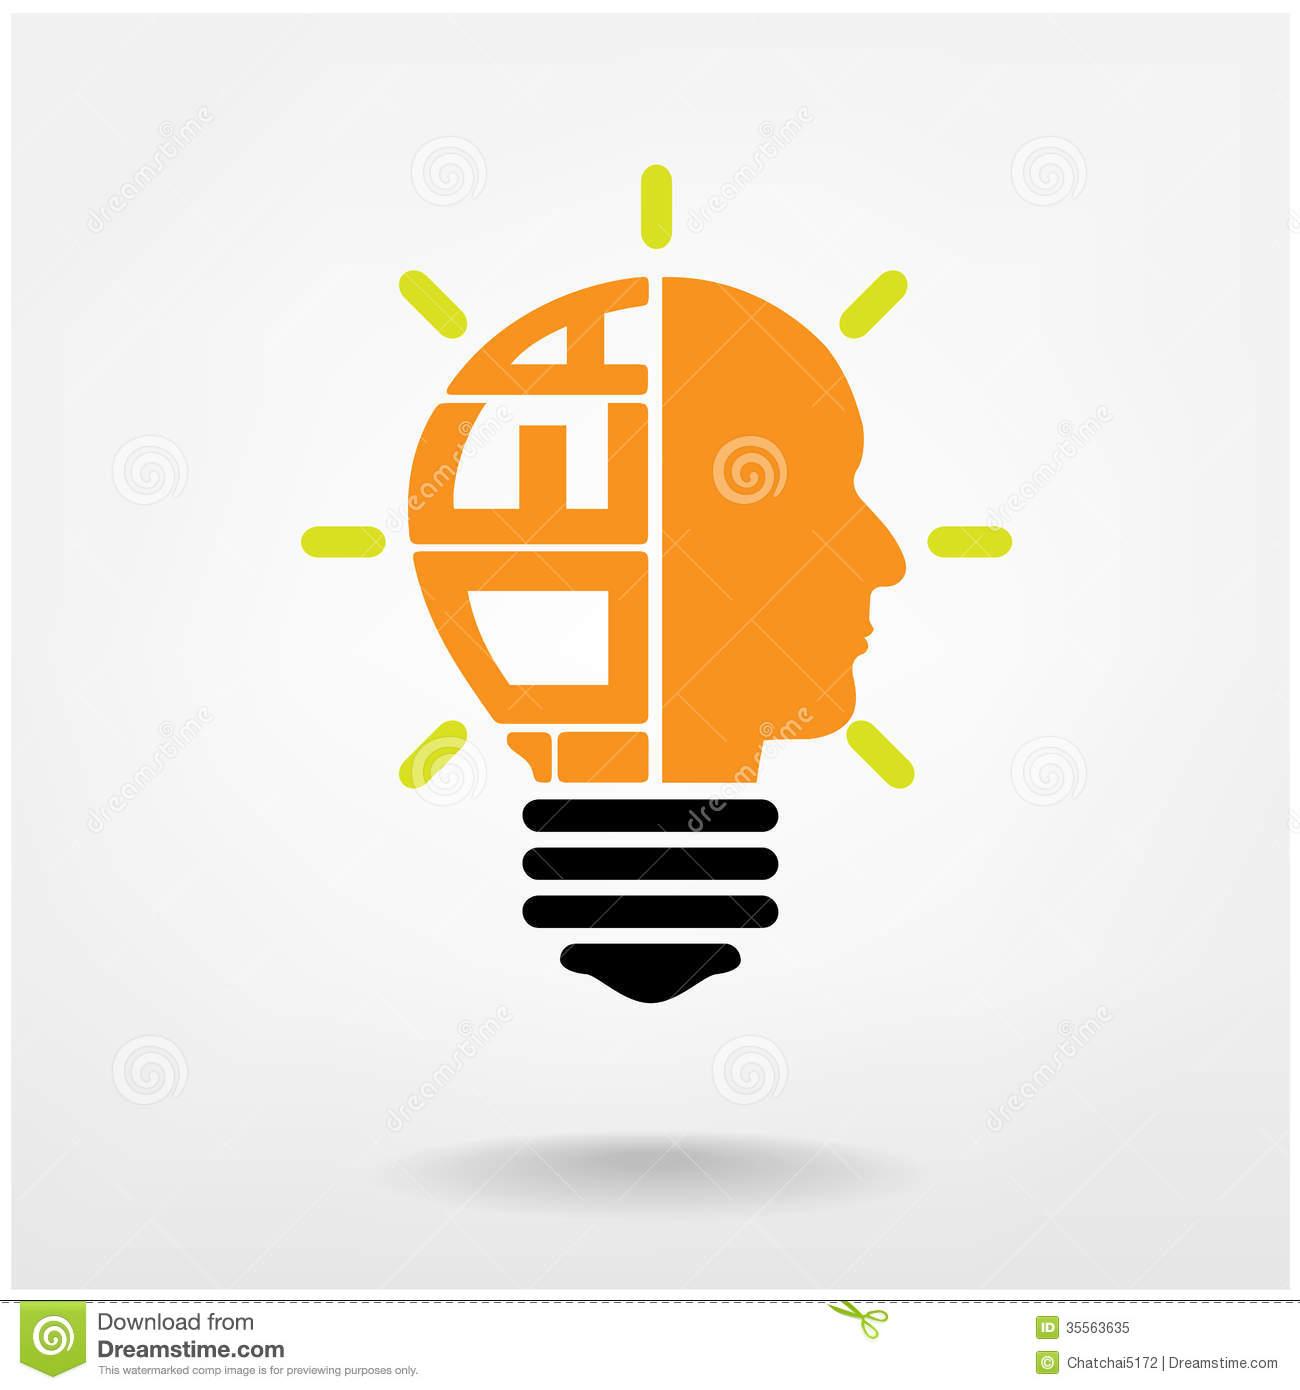 light-bulb-idea-icon-idea-icon-creative-light-bulb-sign-business-ideas    Idea Light Bulb